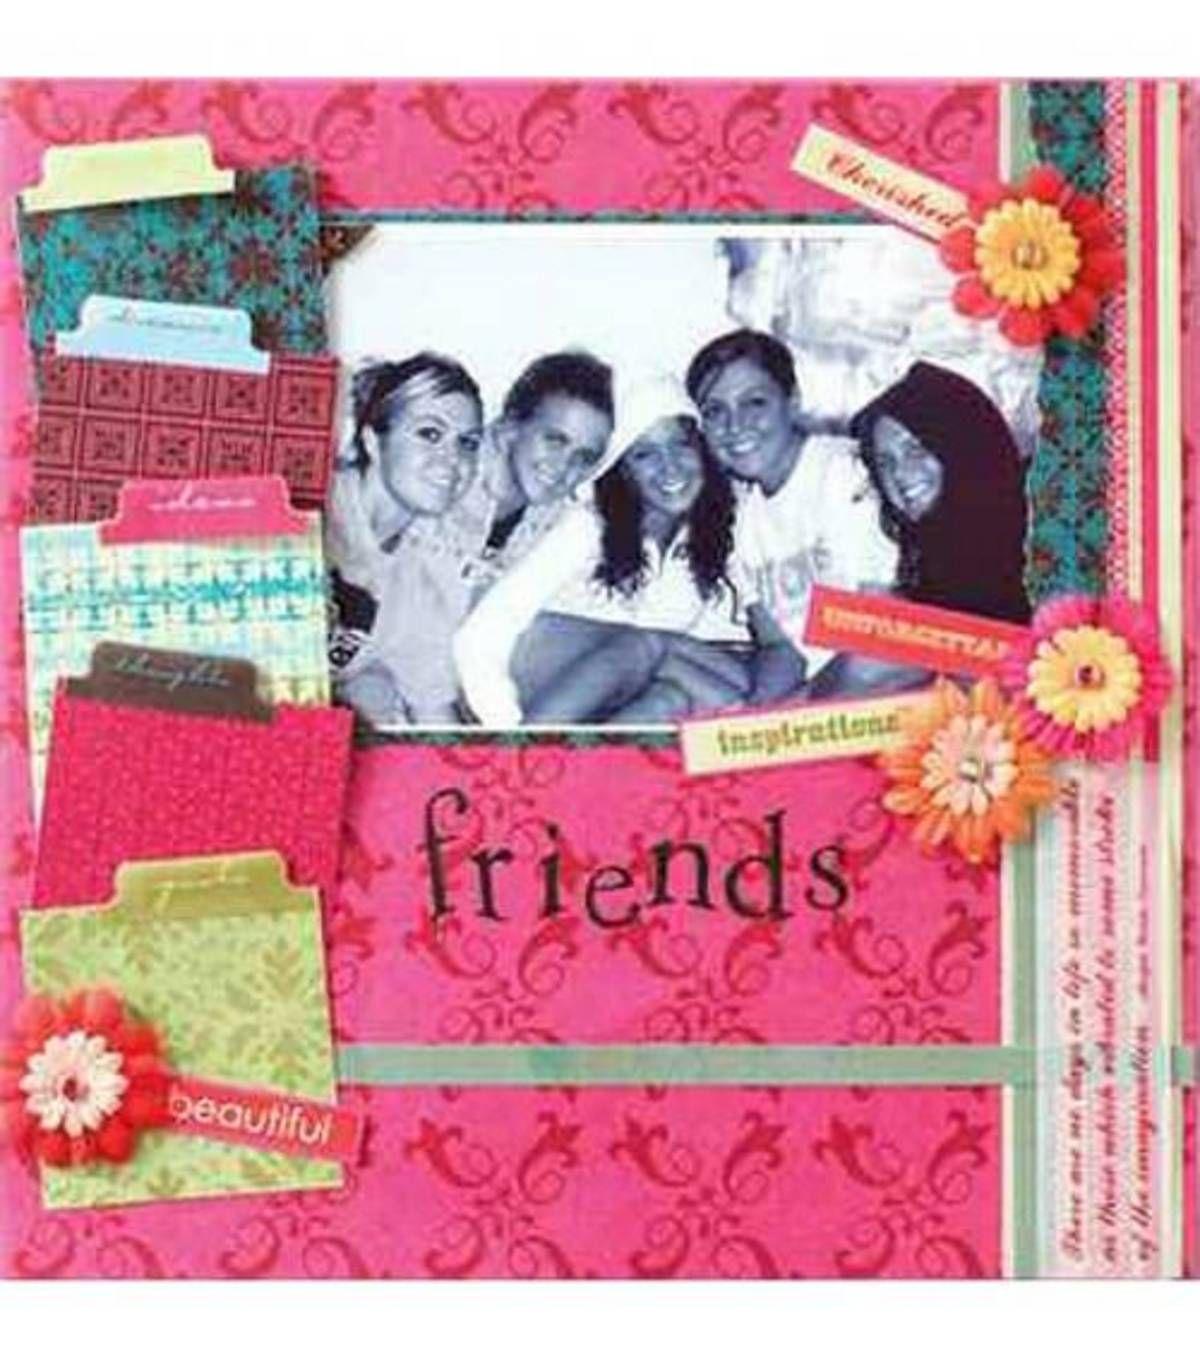 Scrapbook Cover Page Ideas : Scrapbook cover ideas for friend pixshark